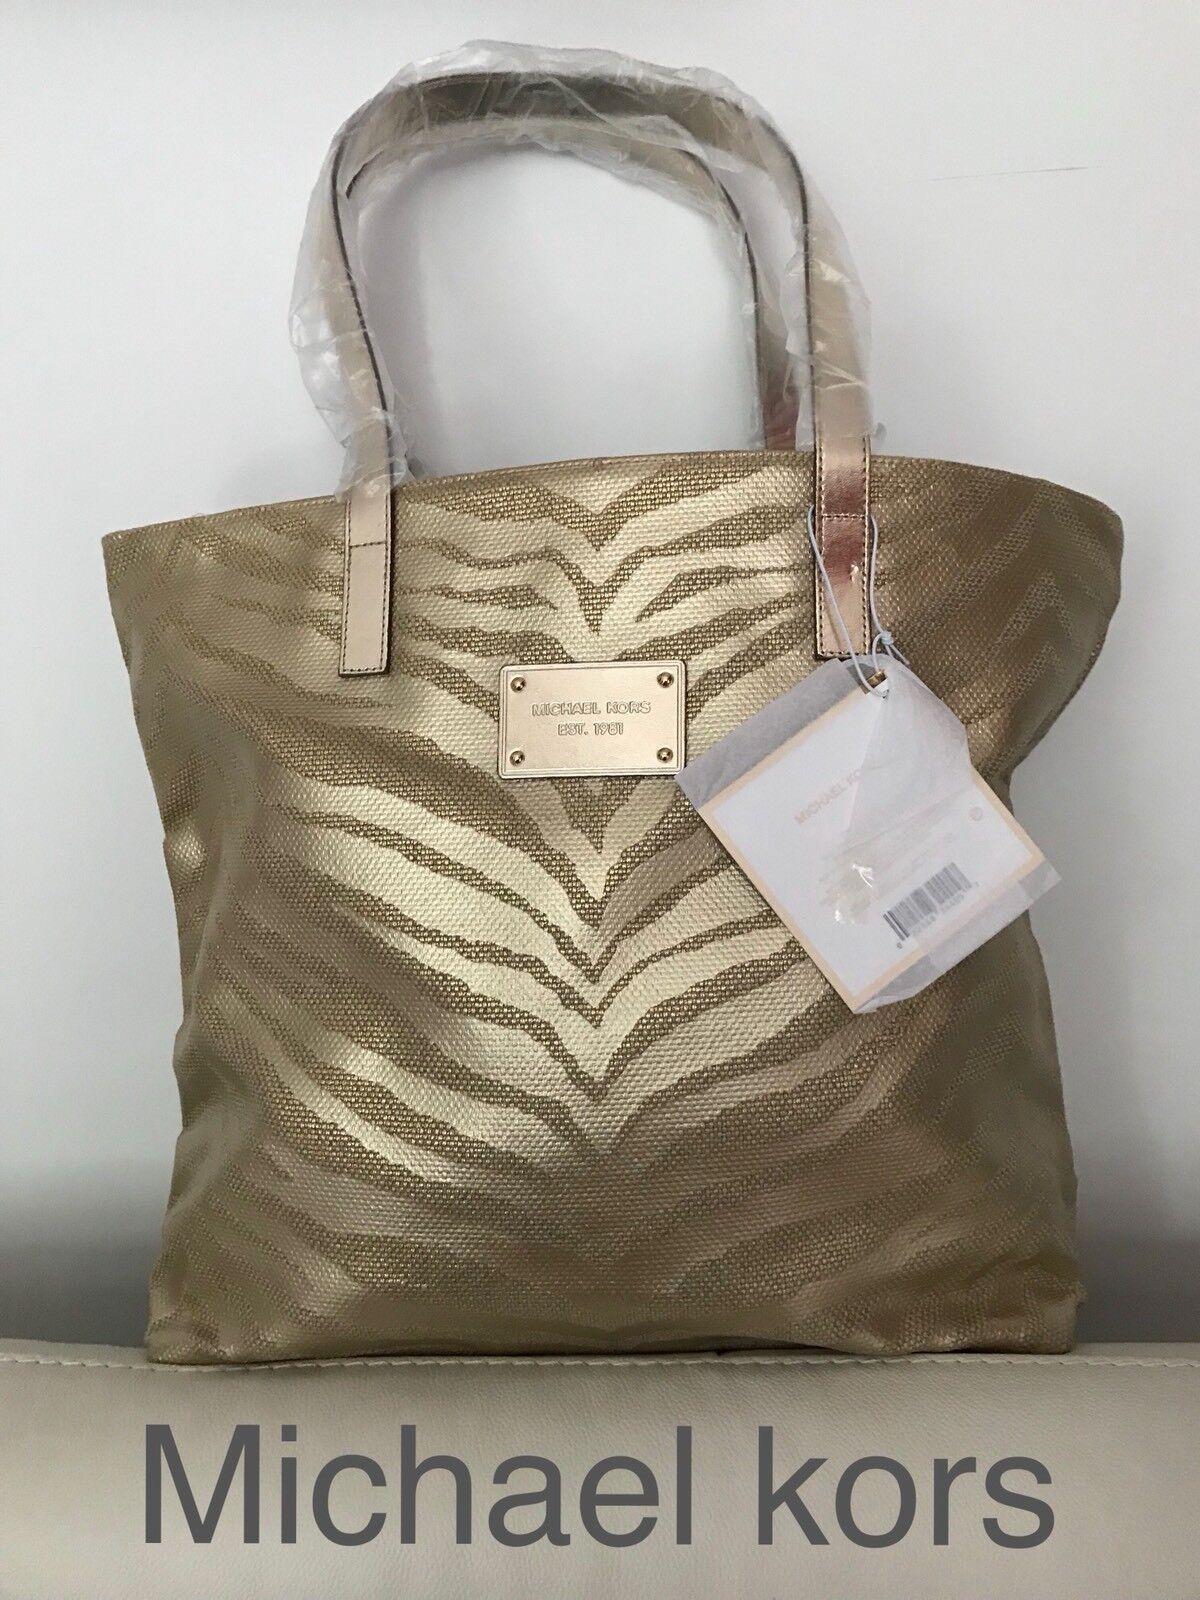 e83df2e9547d MICHAEL KORS LADIES GOLD TIGER PRINT TOTE SHOPPER BAG Brand New ...